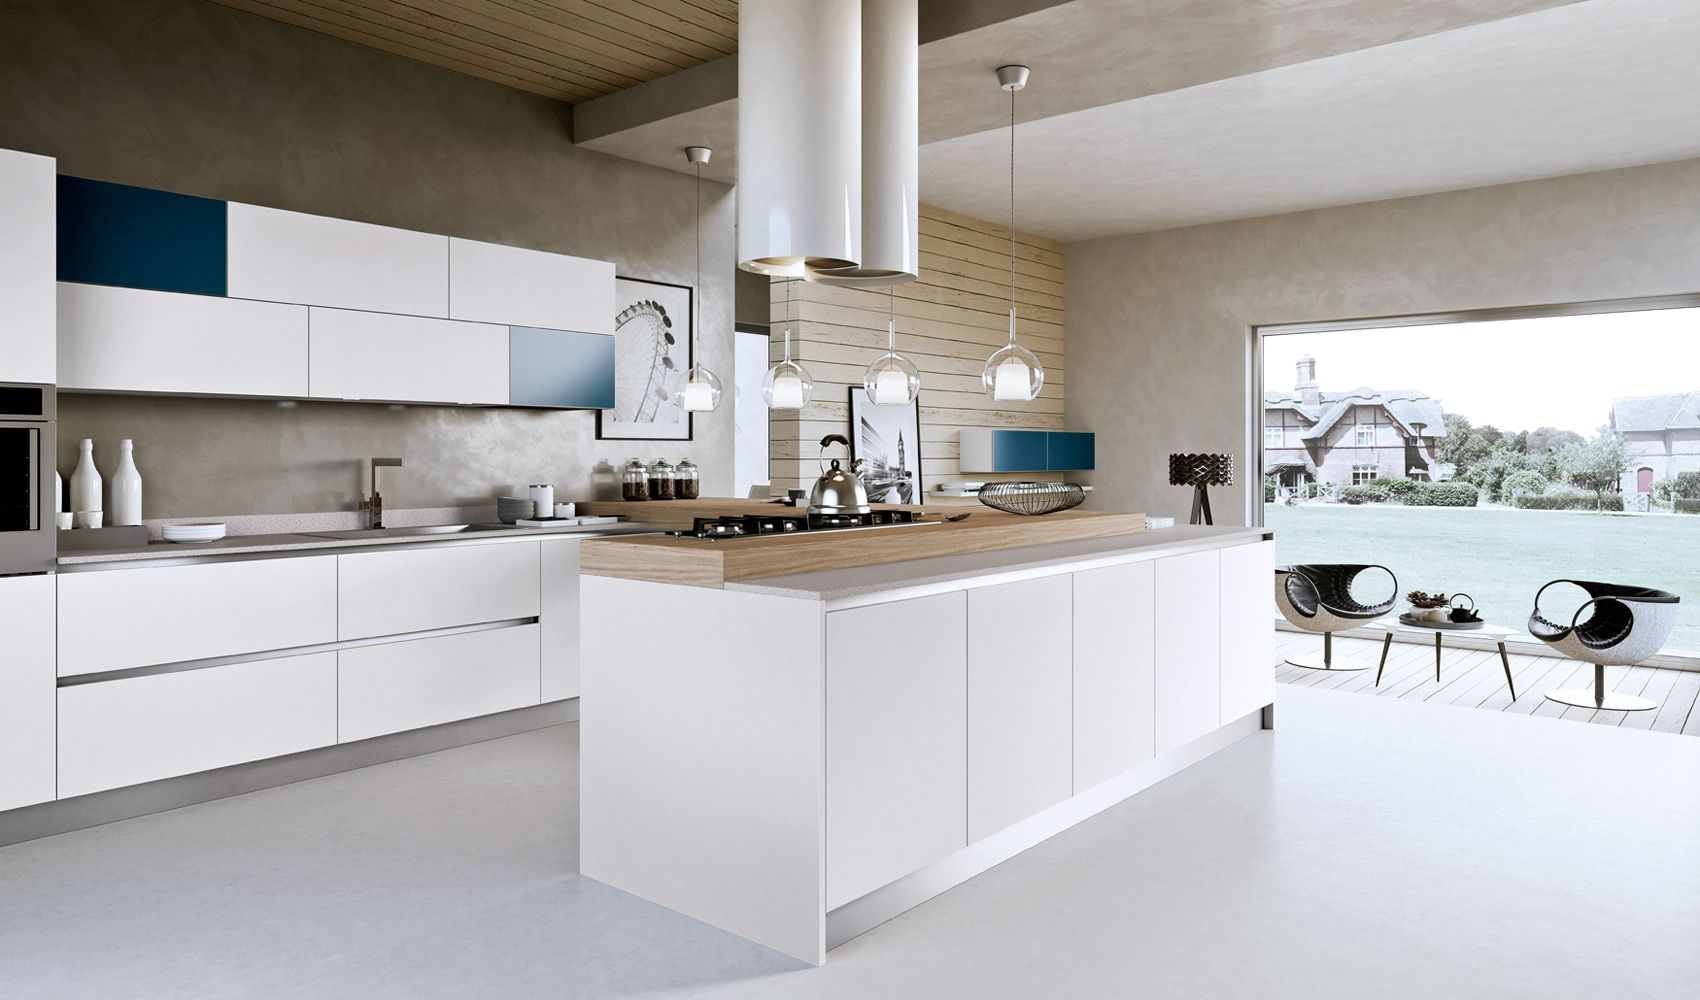 Whitebluekitcheng kitchens that pop pinterest